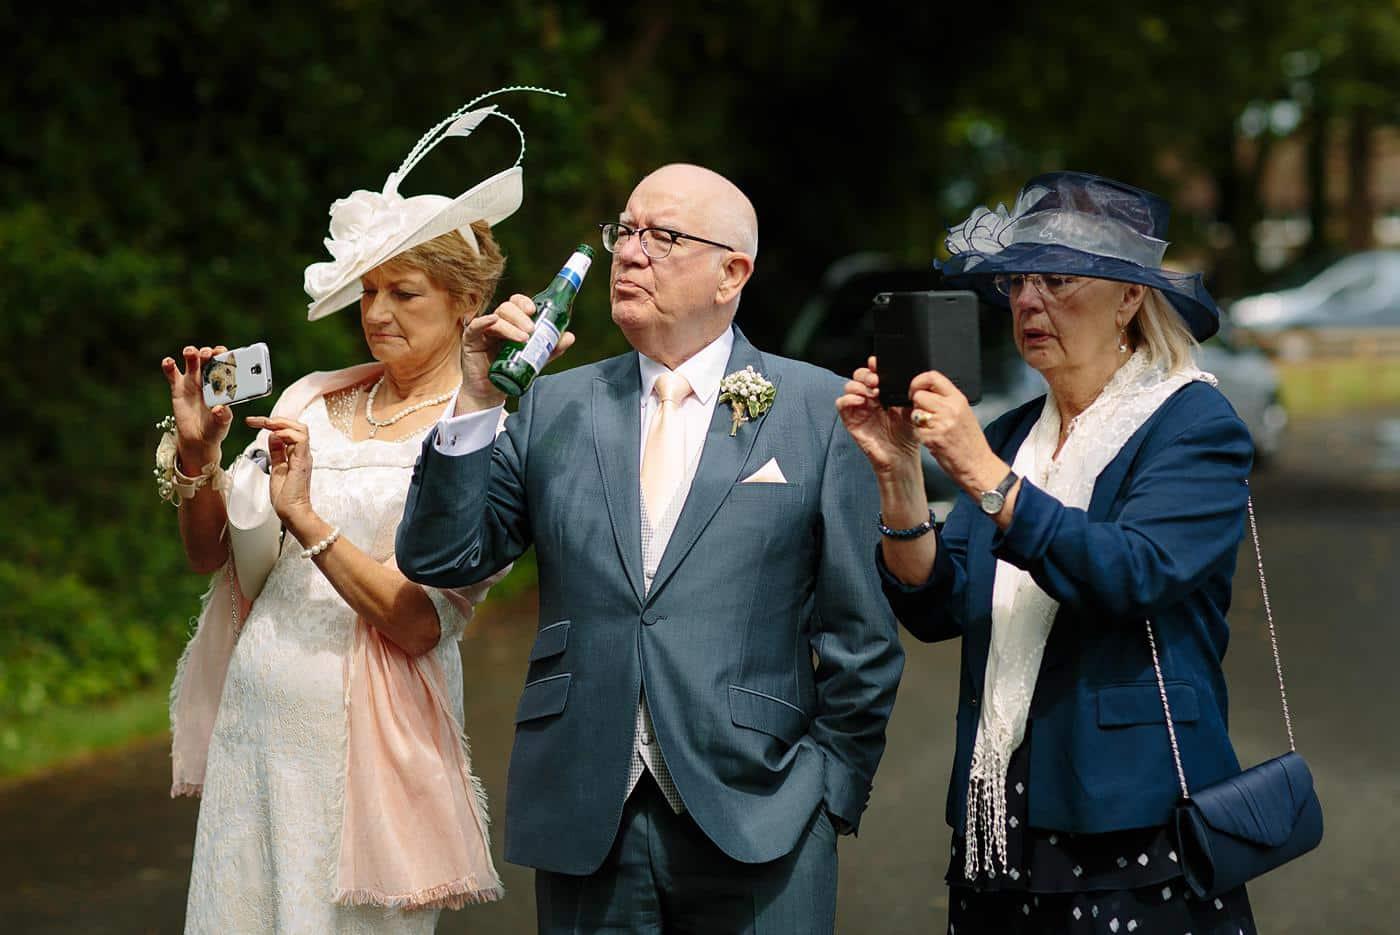 Winstanstow wedding photography 0647